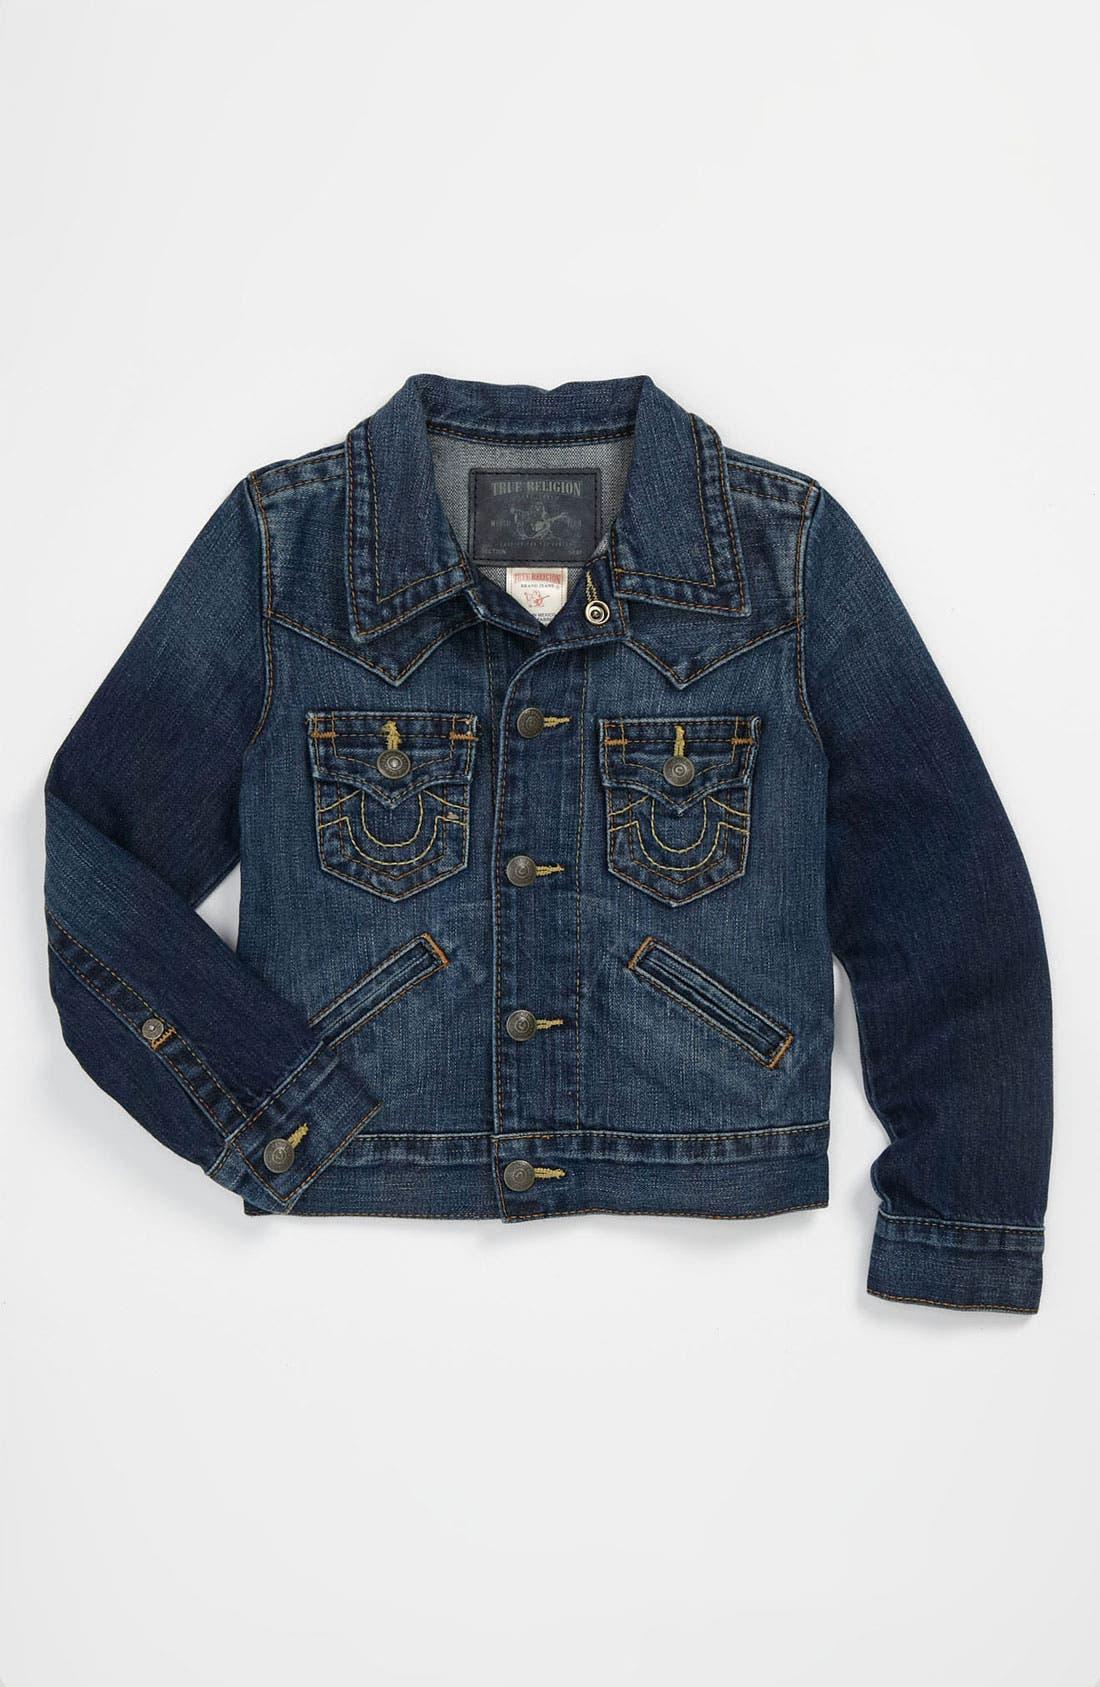 Main Image - True Religion Brand Jeans 'Johnny' Denim Jacket (Little Boys)